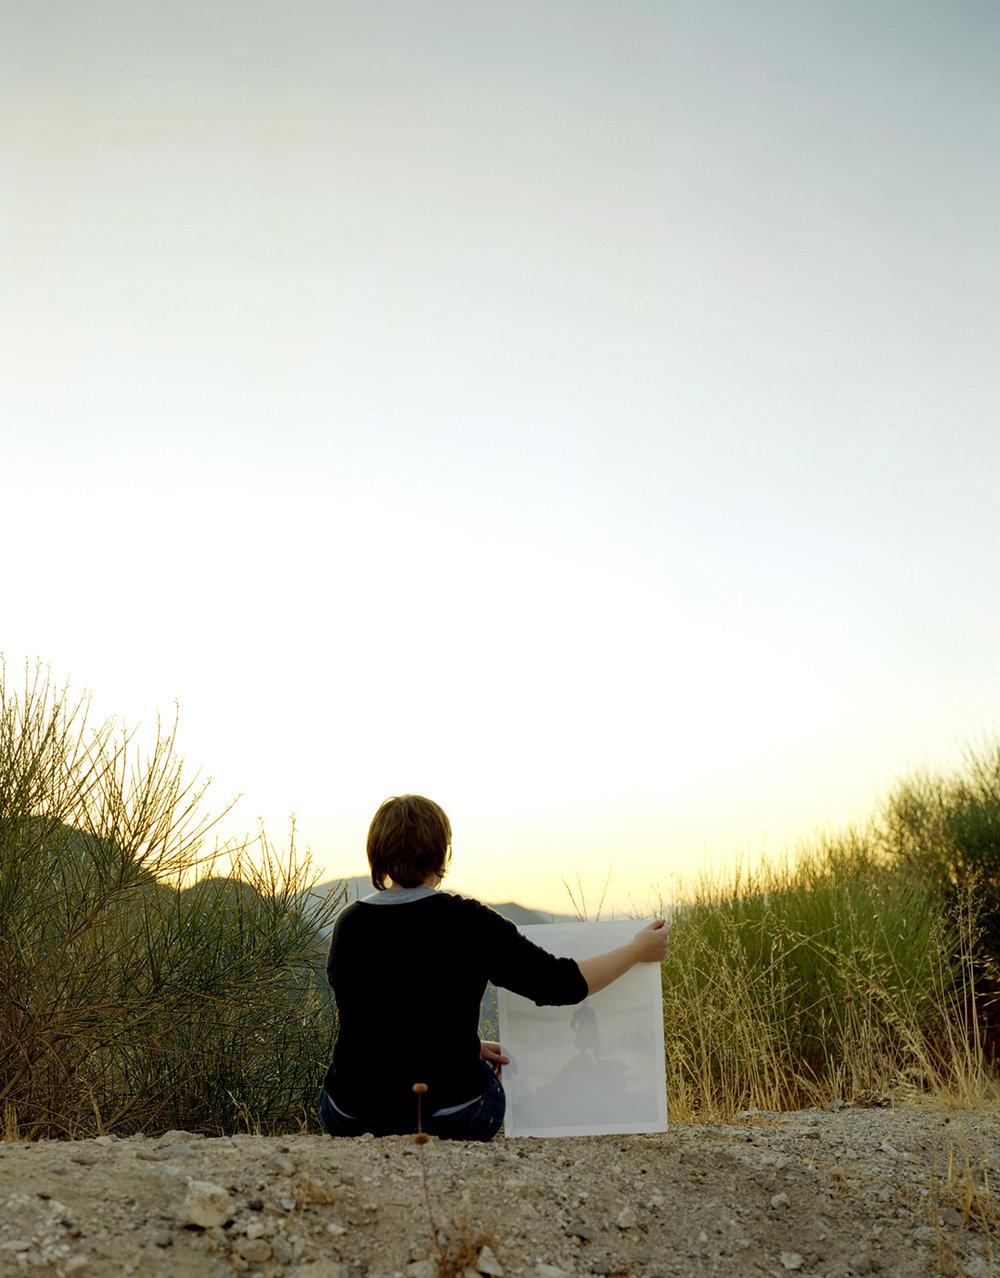 005thompson_mtdisappointmentcalifornia(sunset).jpg